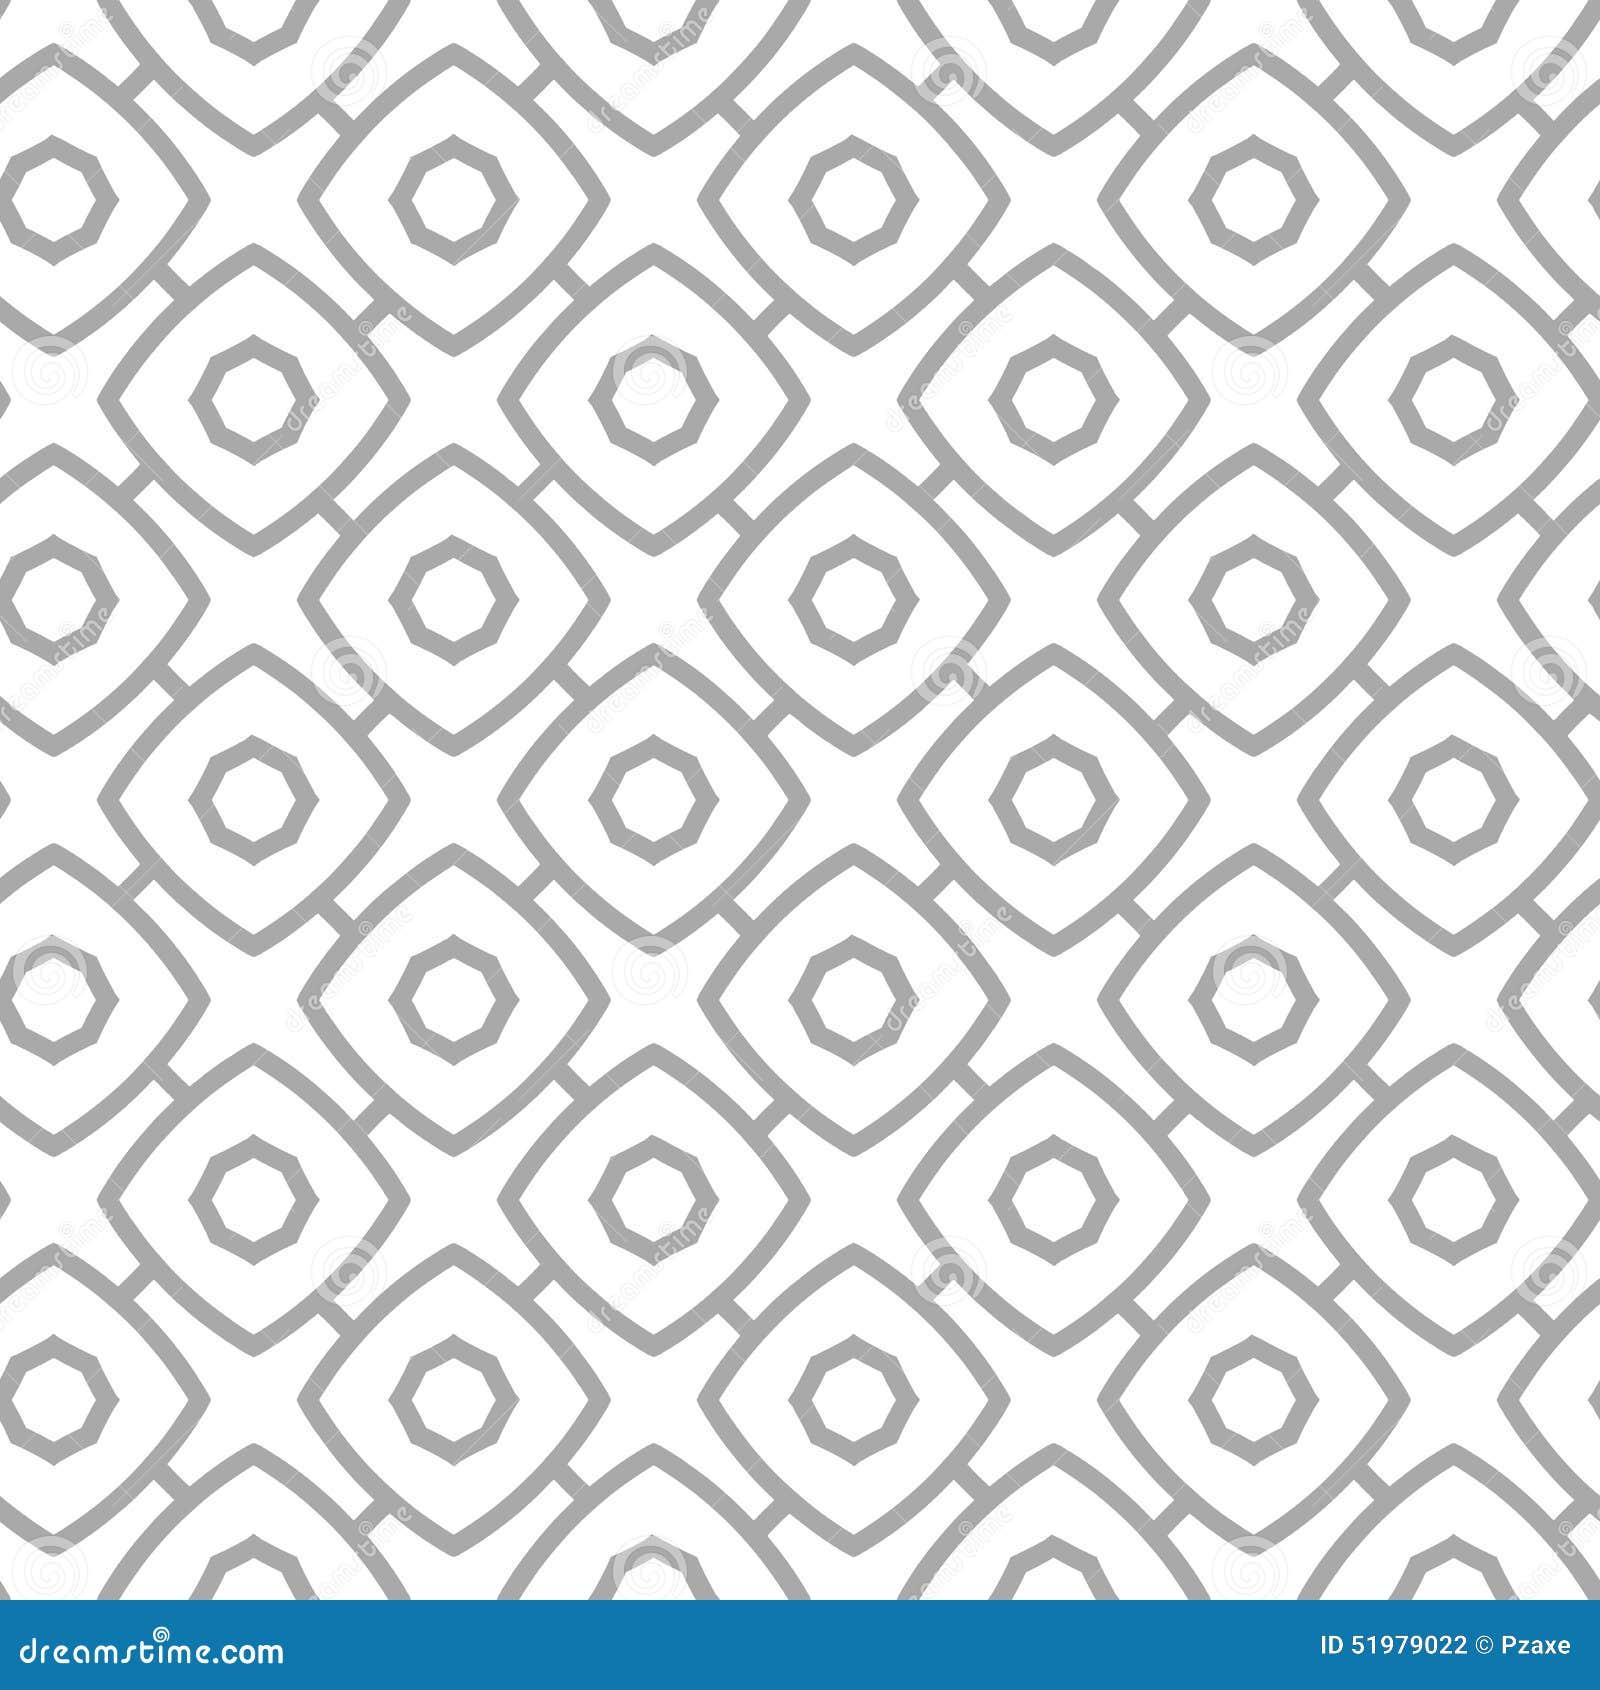 simple geometric vector seamless pattern